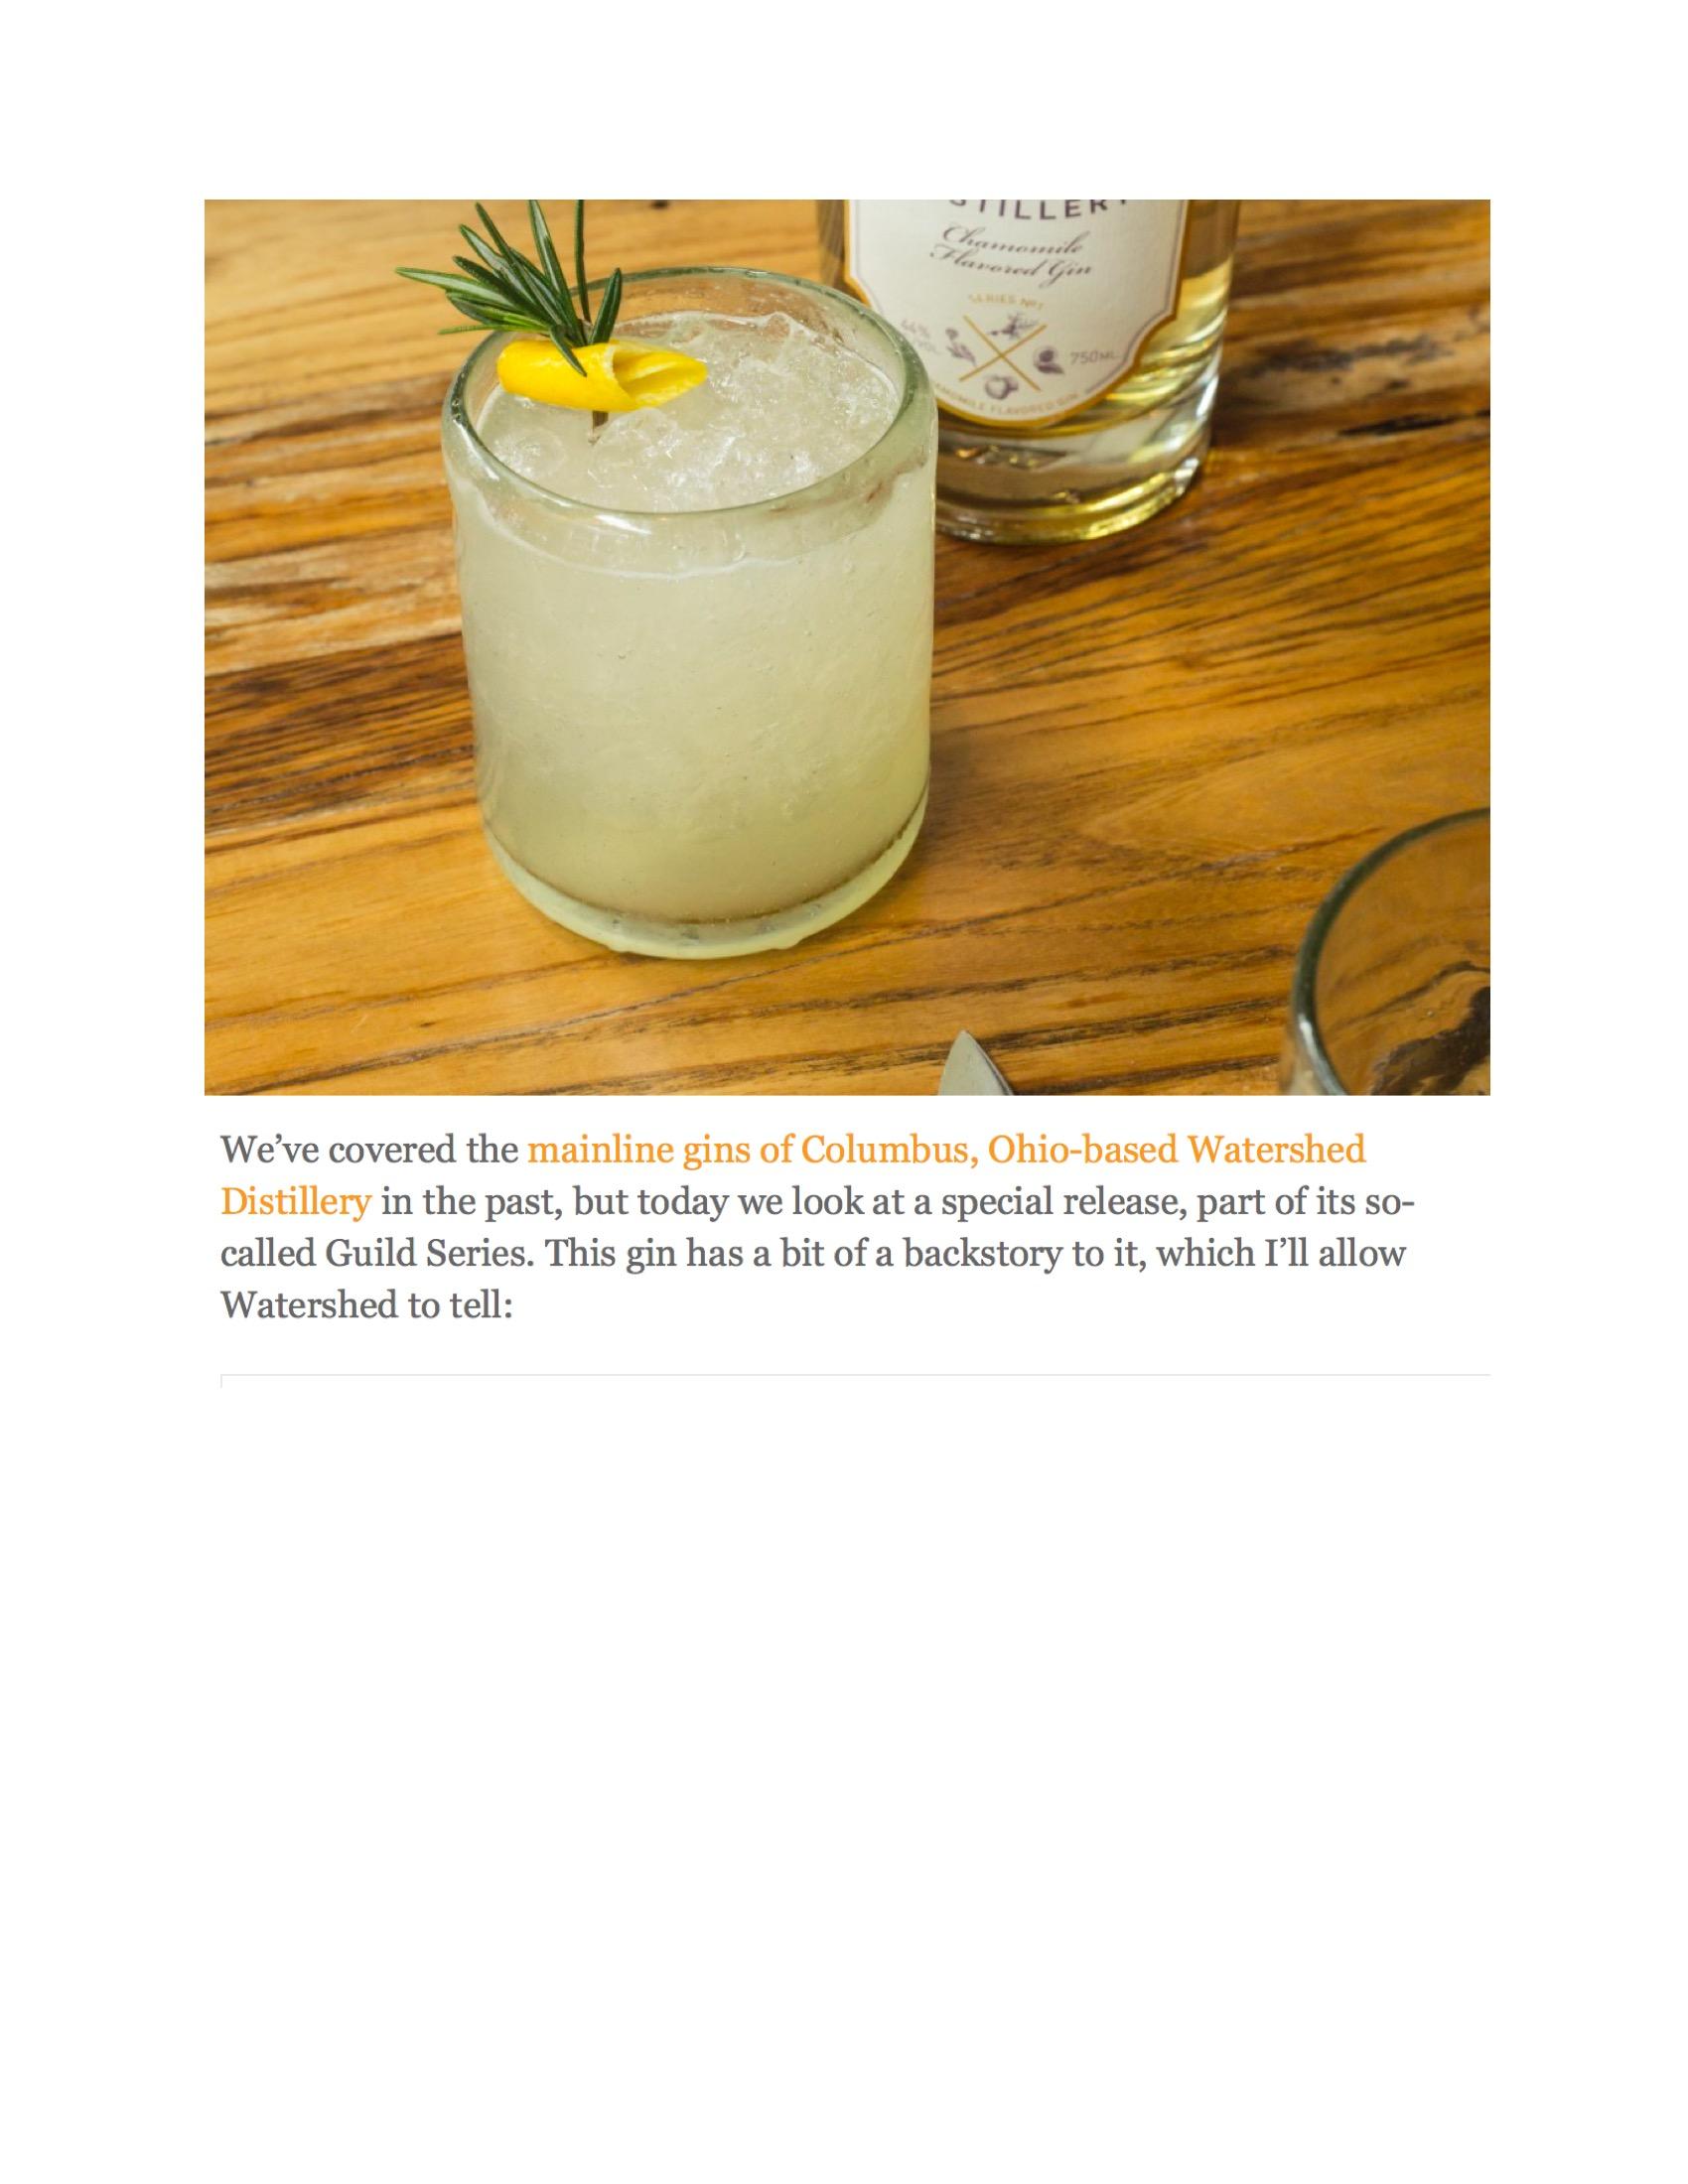 Aug 5 Drinkhacker 3-3.jpeg